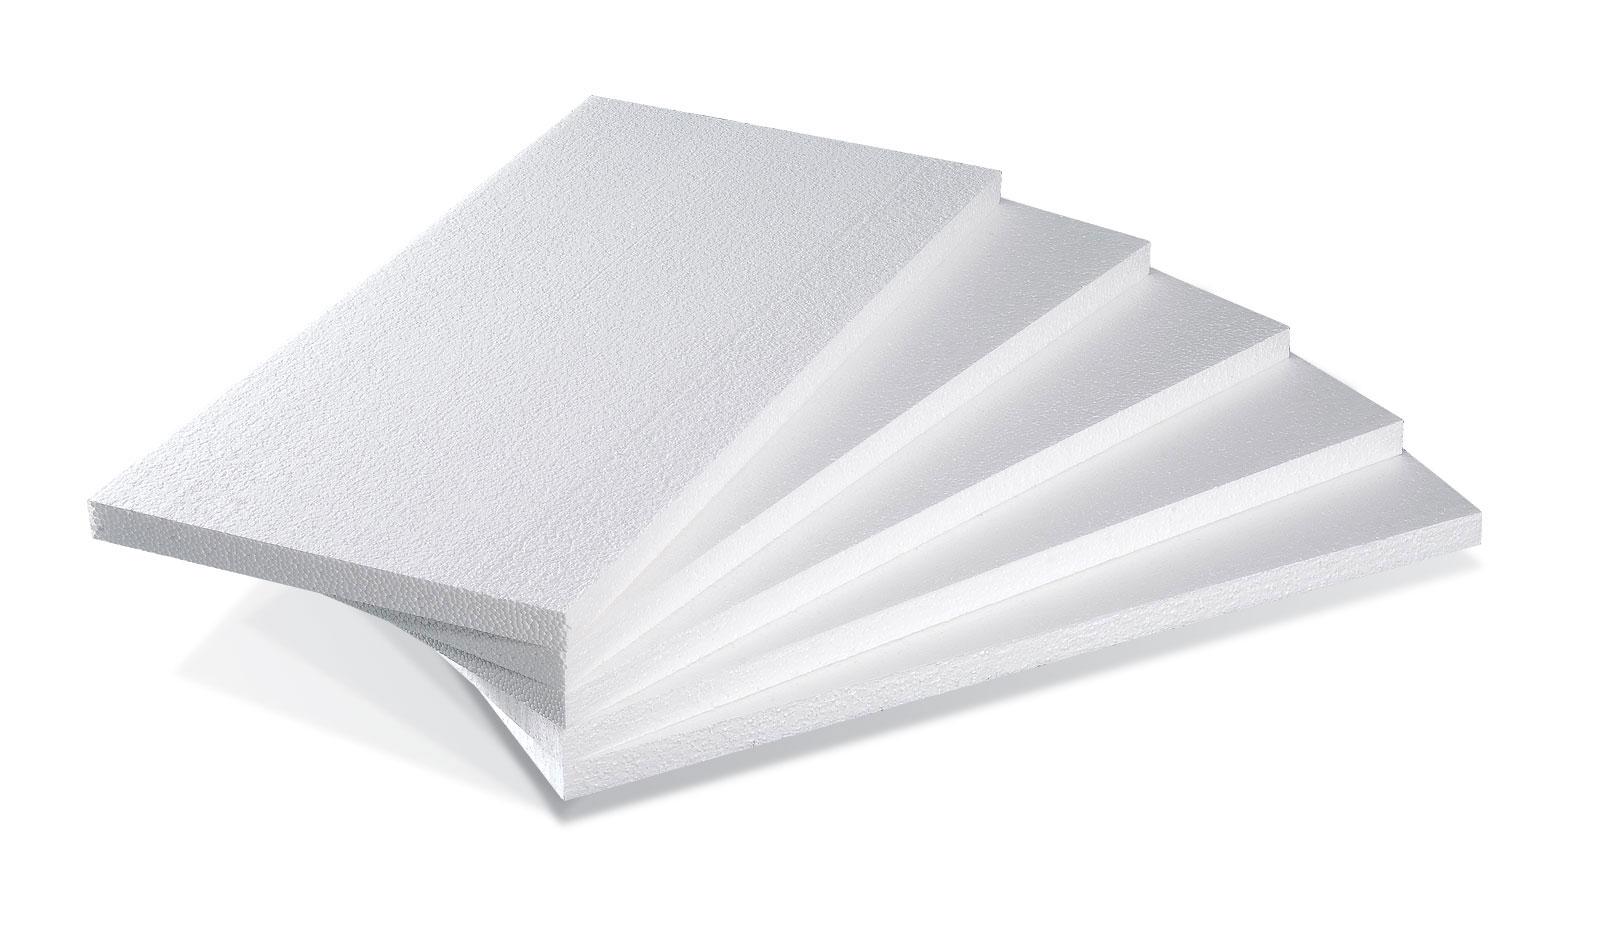 Пенопласт (2000х1000) t=100мм (1 лист) 25 г/м